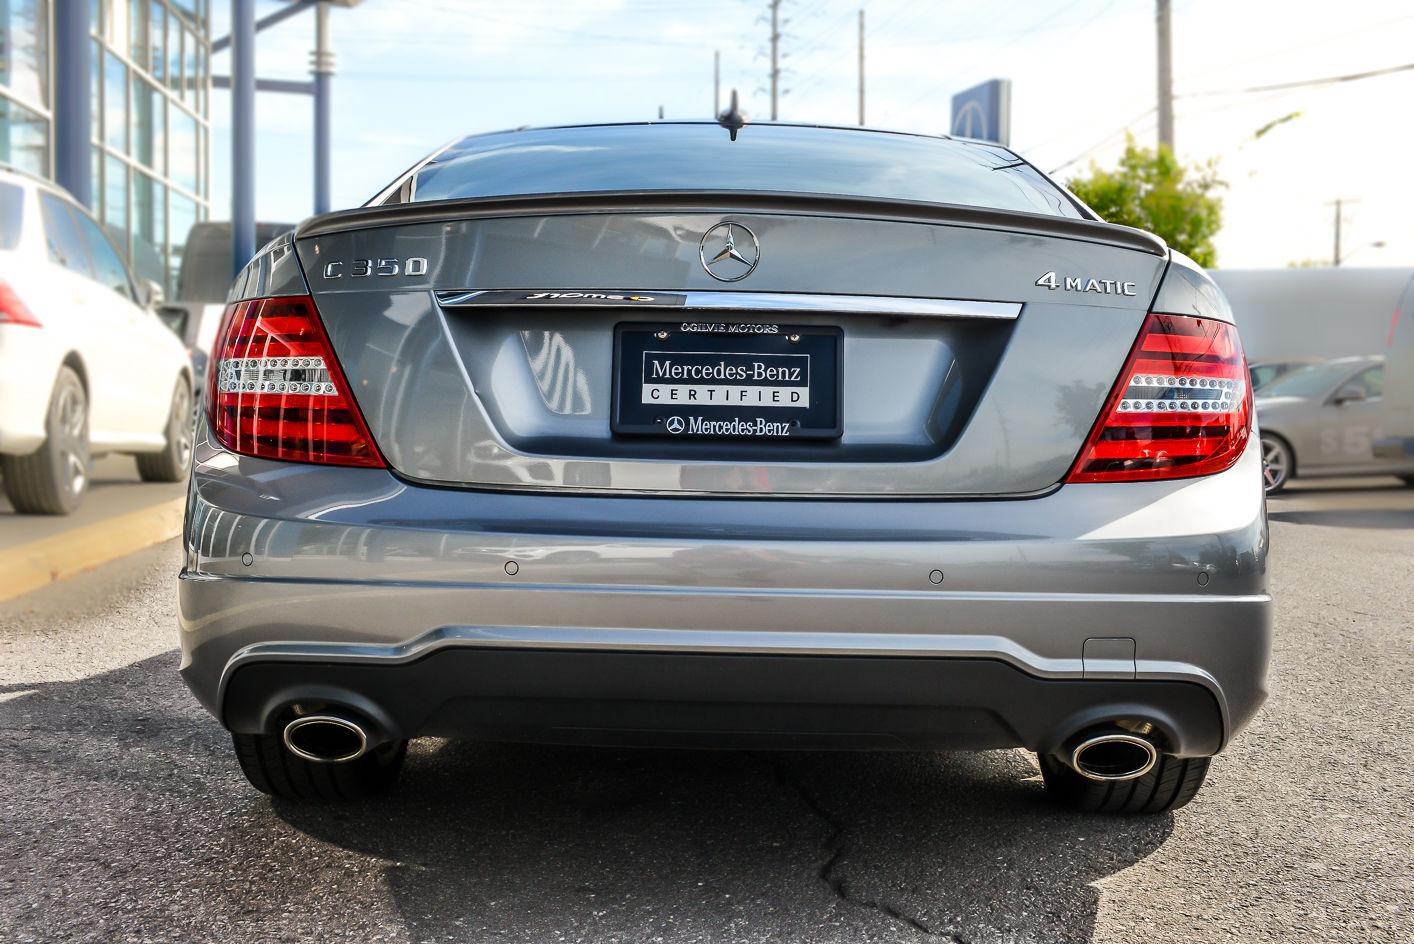 Mercedes benz c350 4matic coupe 2014 d 39 occasion vendre for C350 mercedes benz 2014